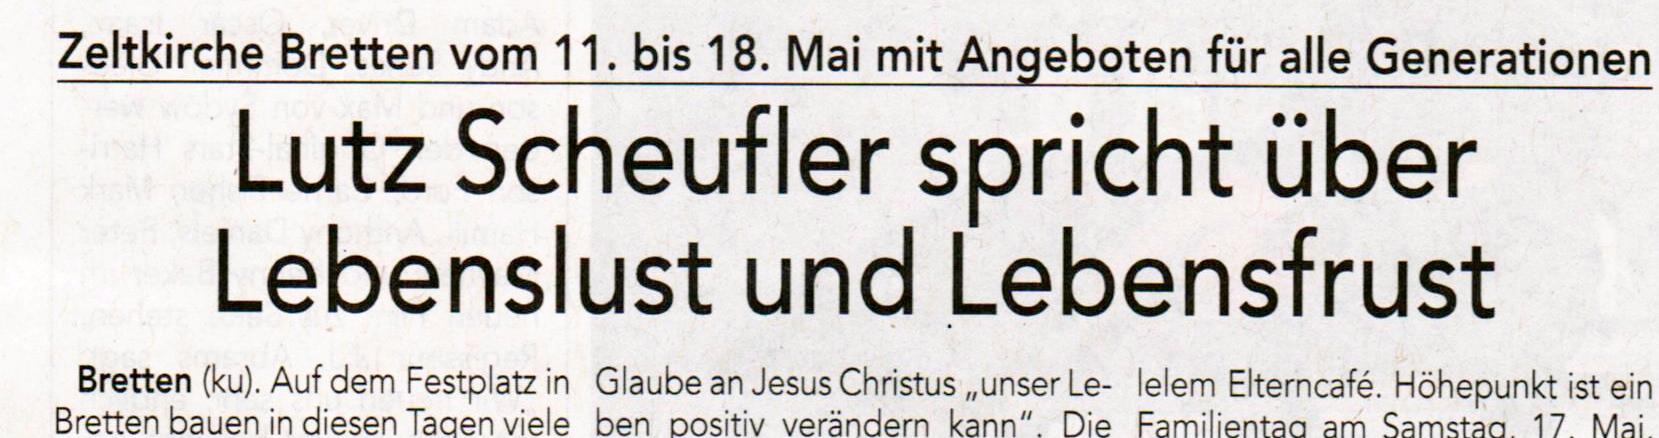 Zeitungsartikel Zeltkirche Bretten